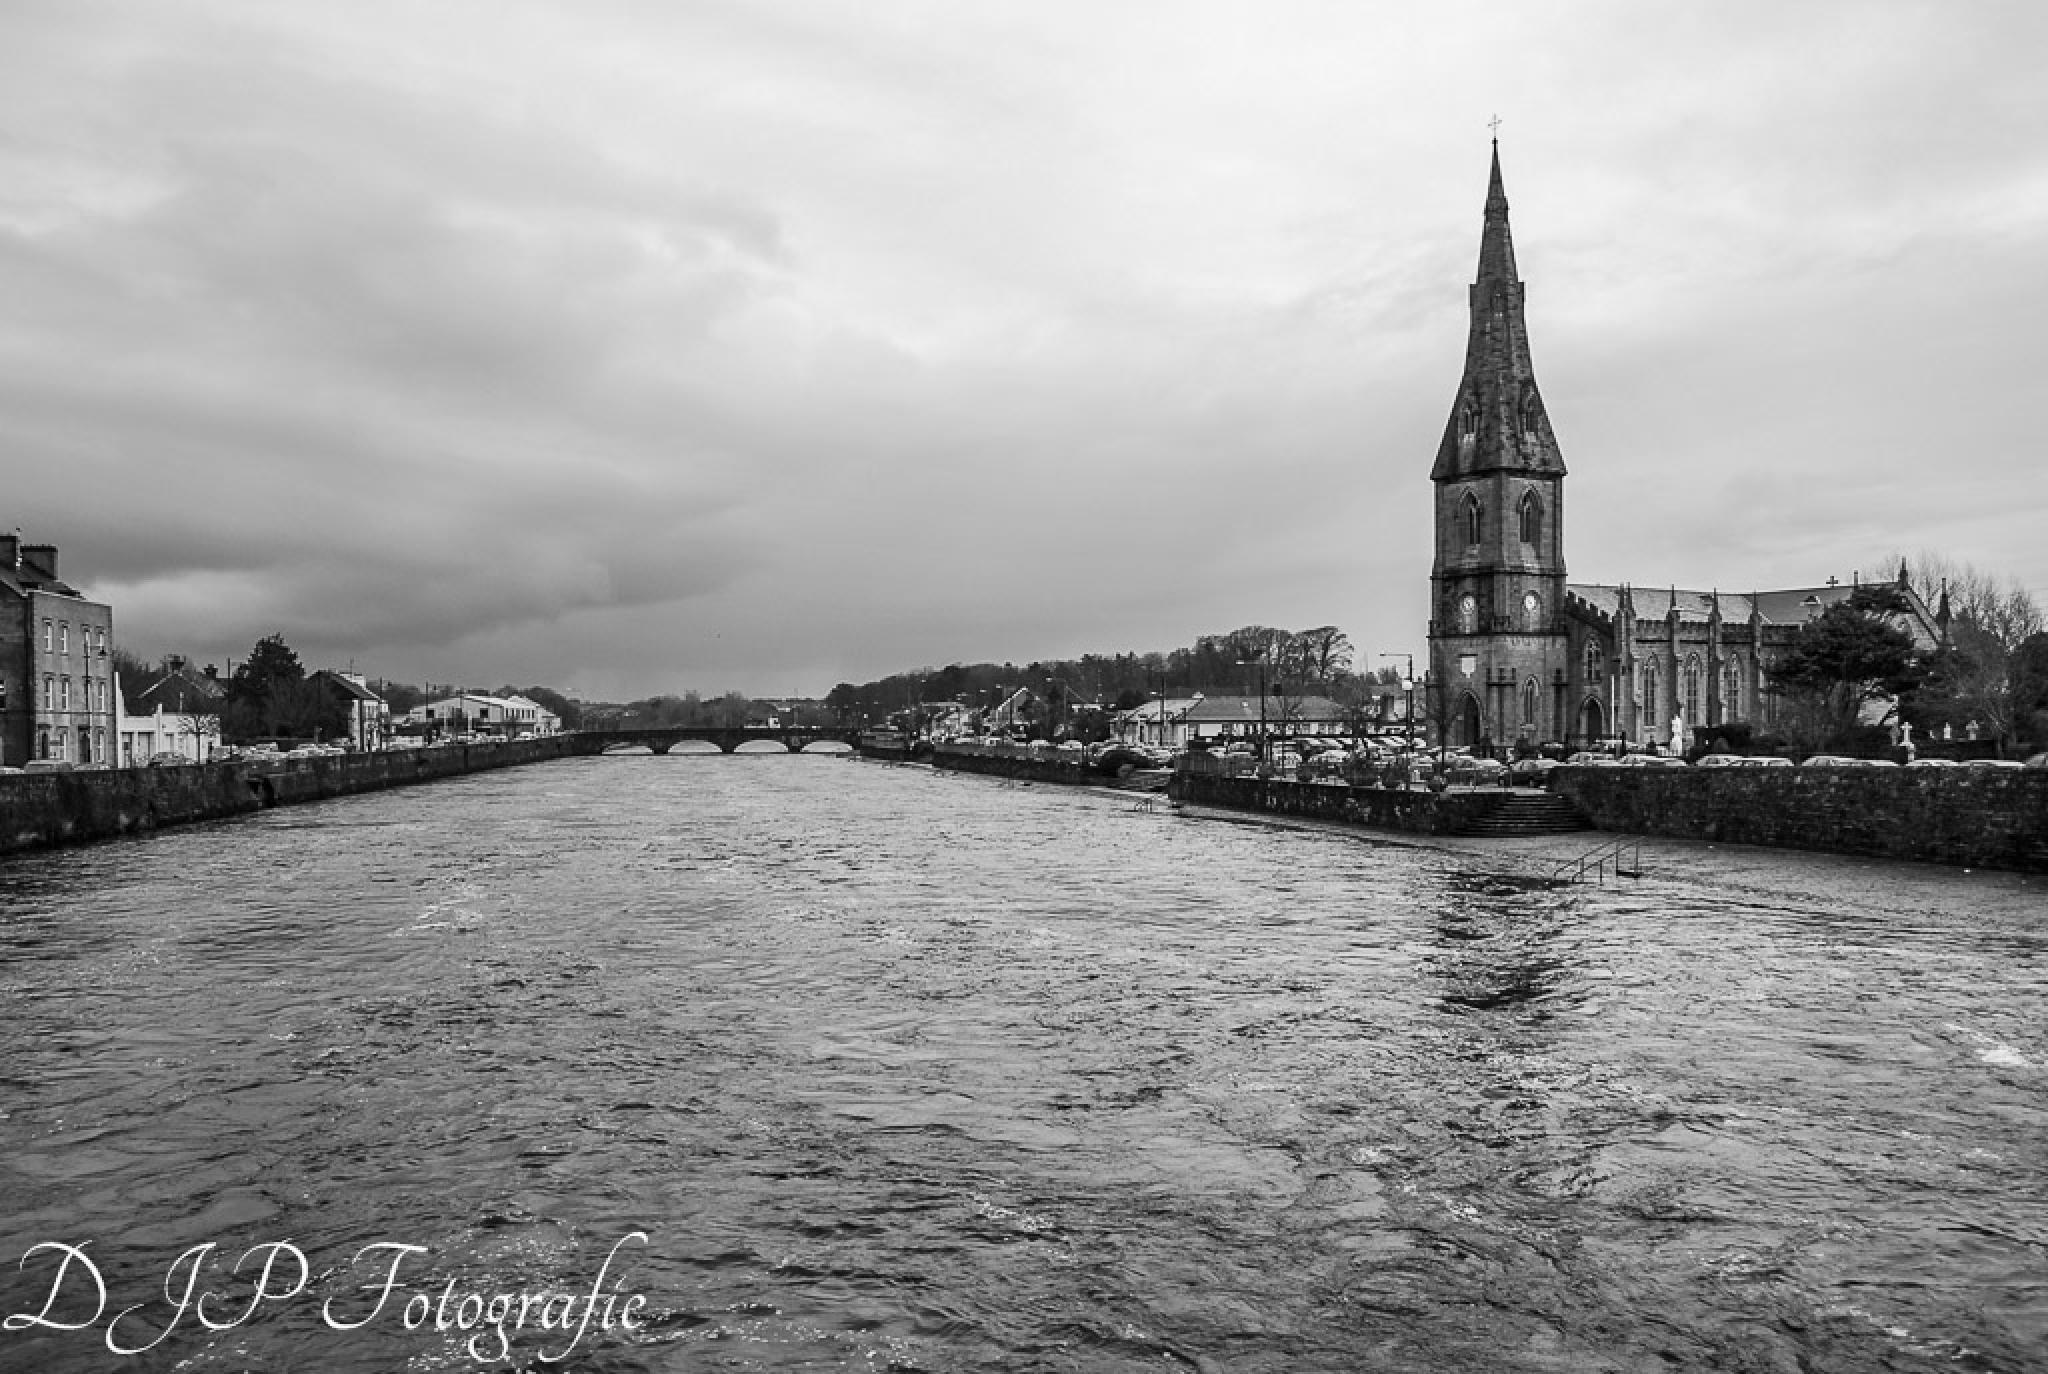 Ballina, Co. Mayo, Ireland by DJP Fotografie